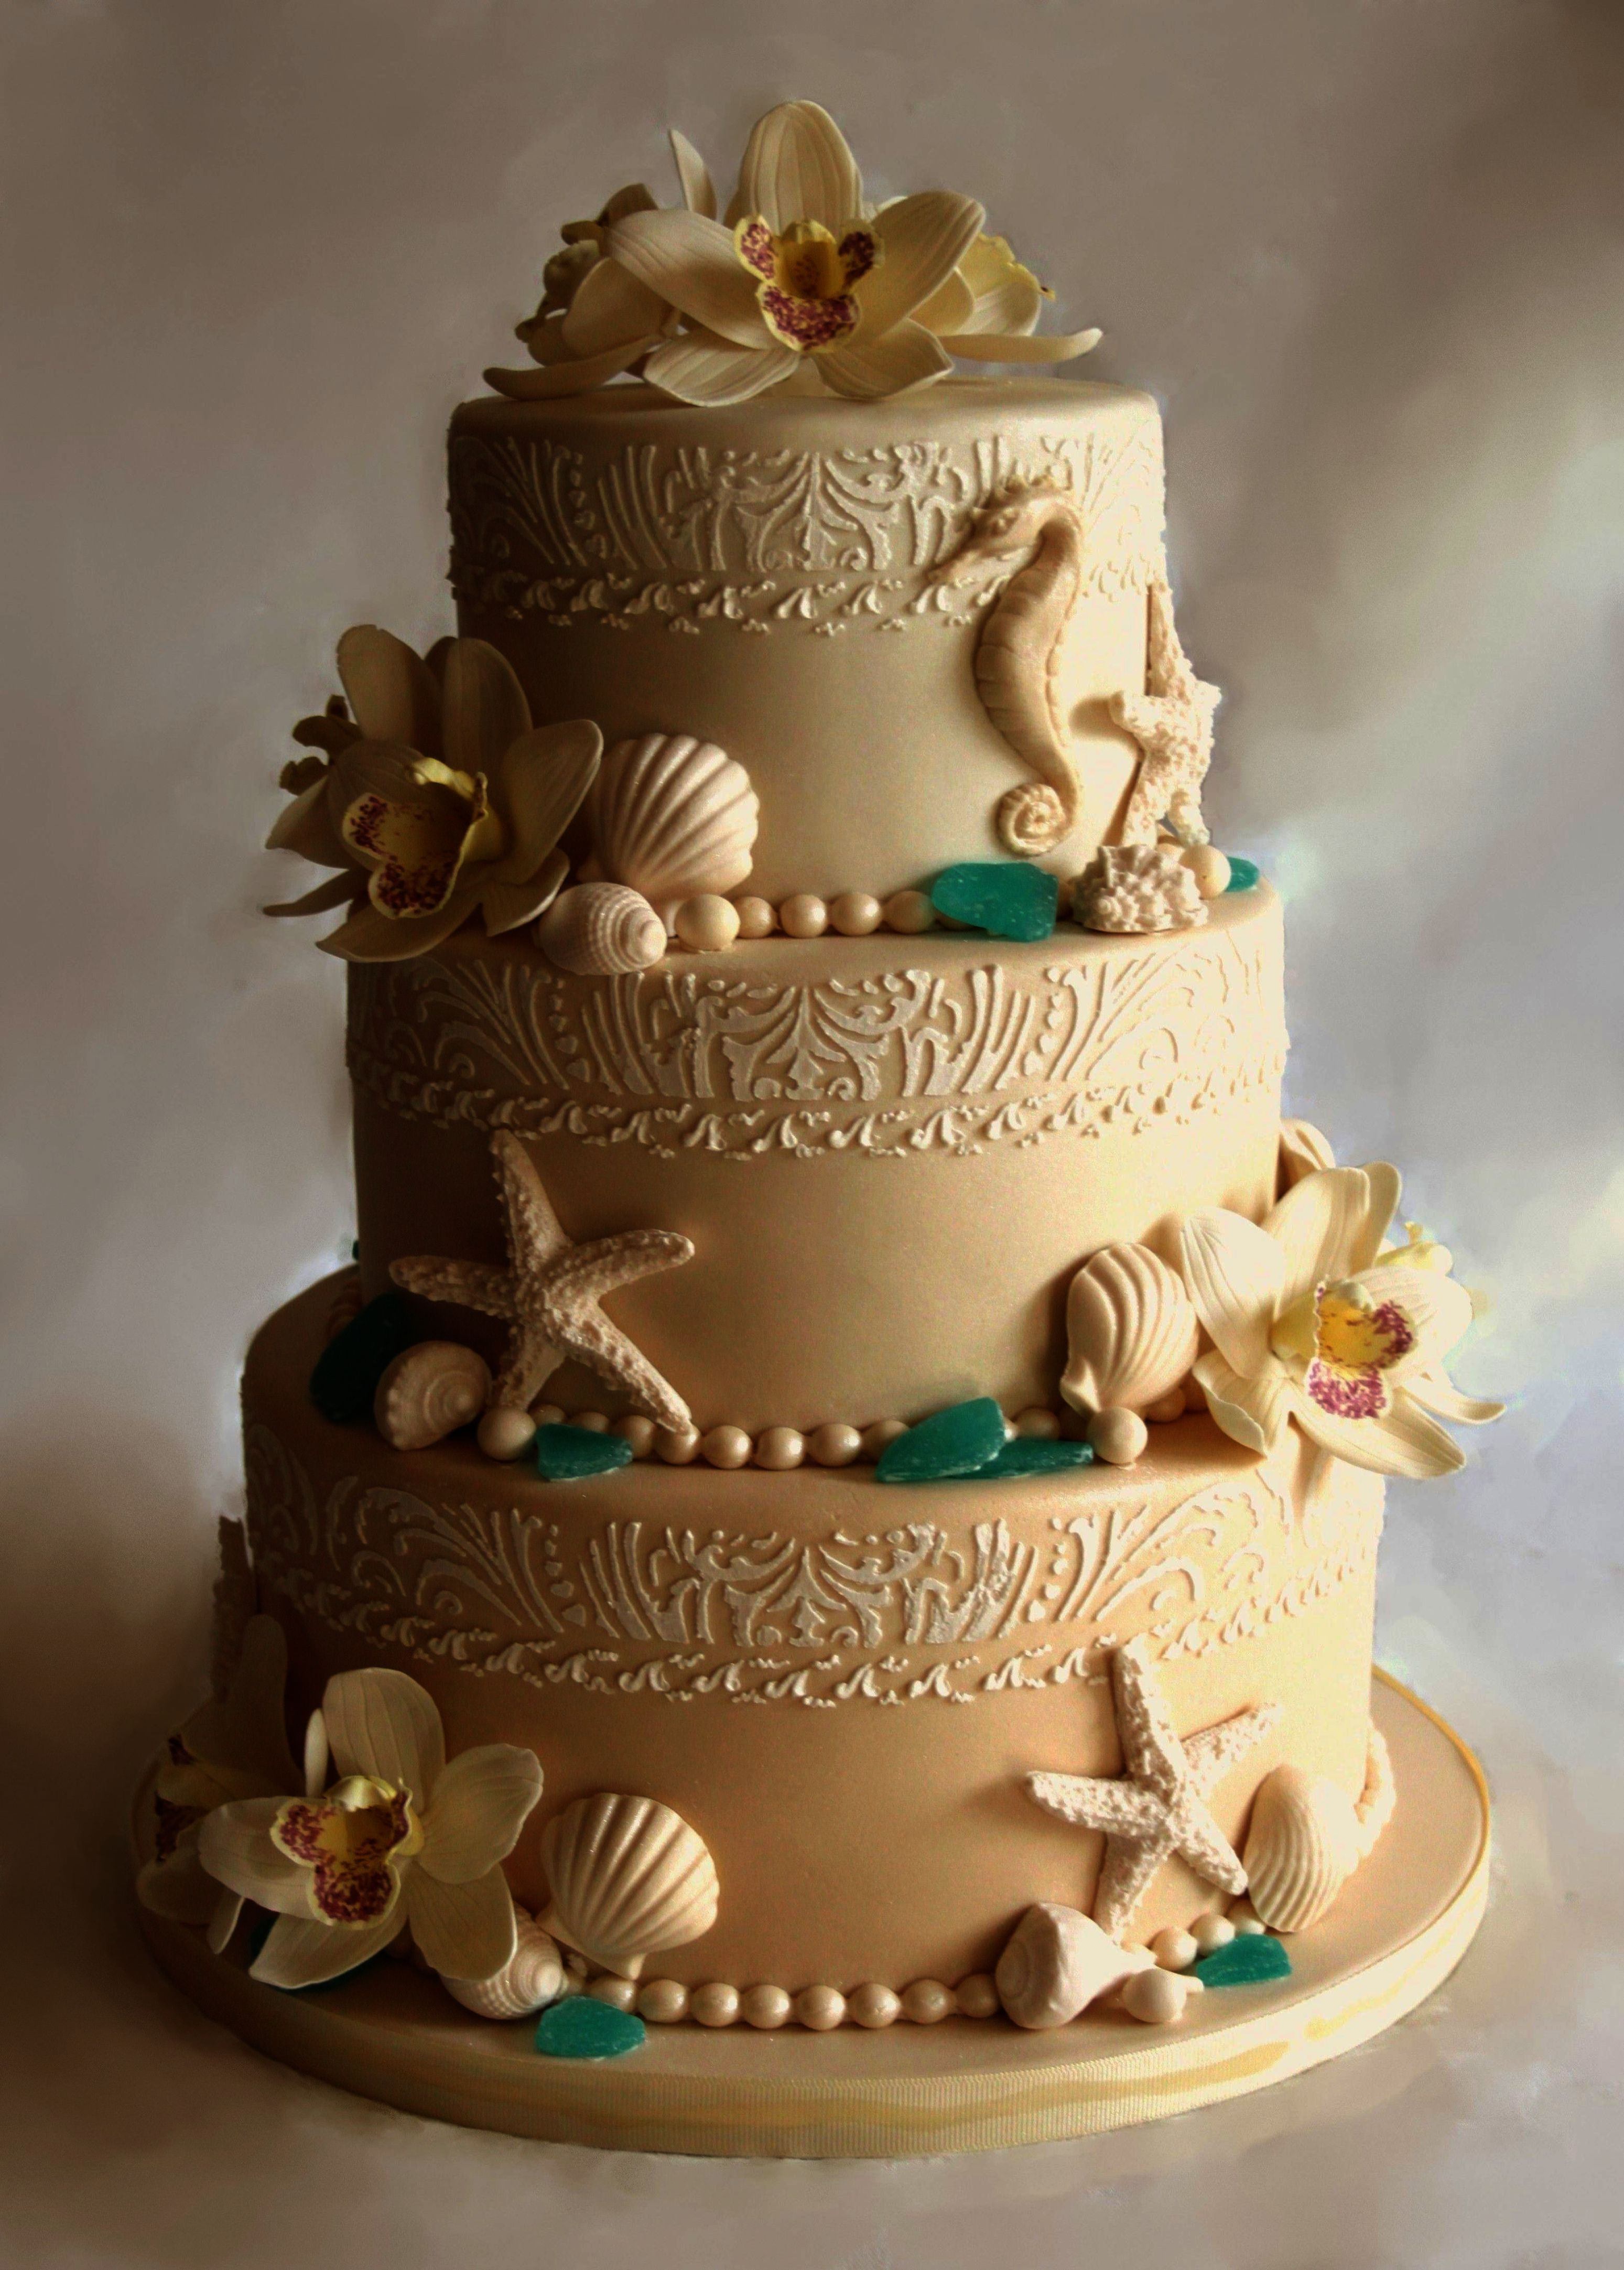 Wedding Cakes Houston Prices Huge Beautiful Wedding Cakes Wedding